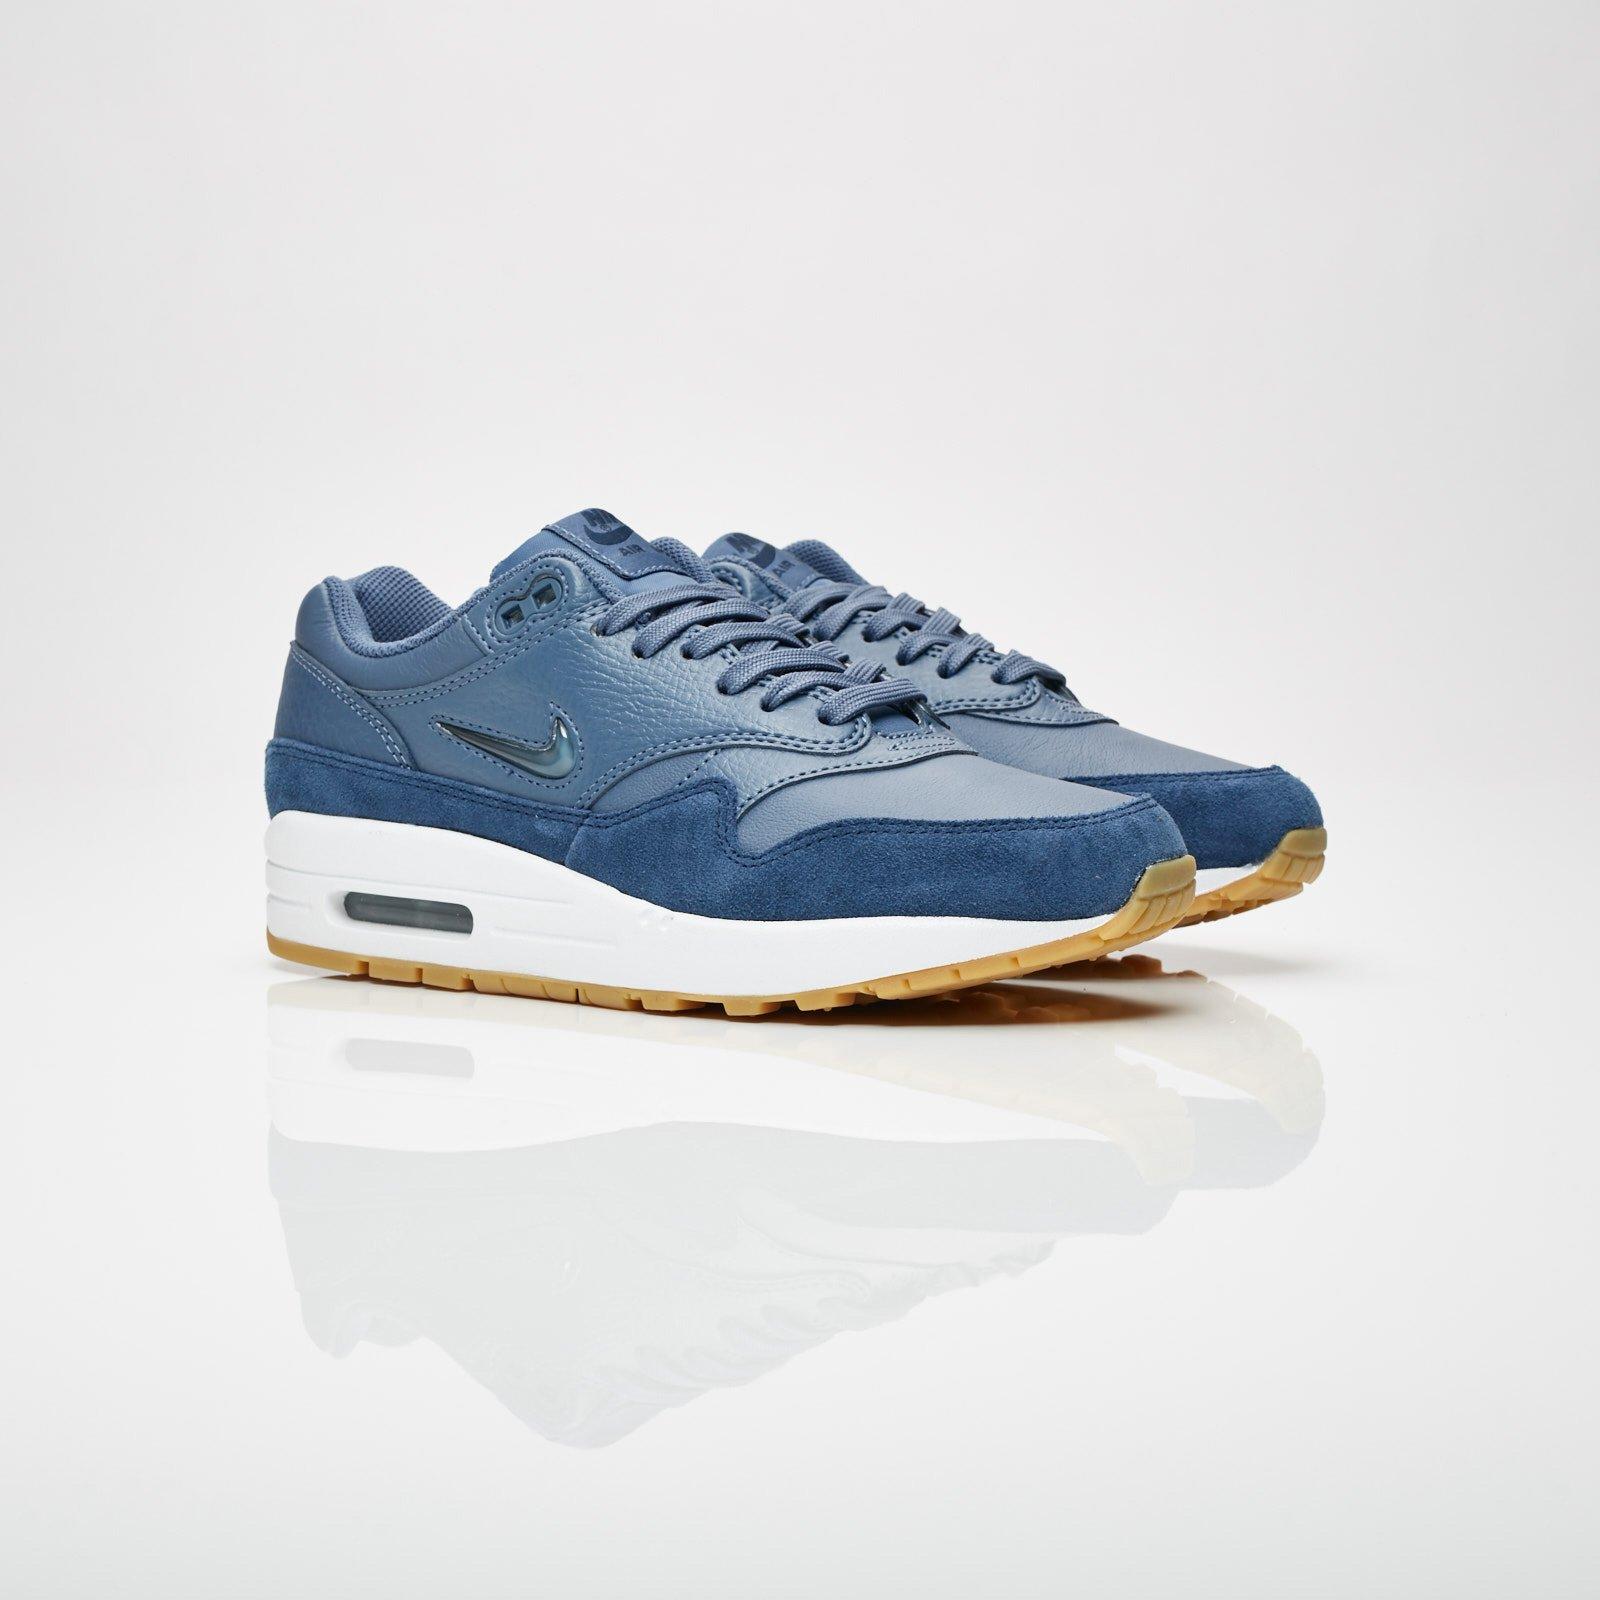 Nike Wmns Air Max 1 Premium SC - Aa0512-400 - SNS   sneakers ...